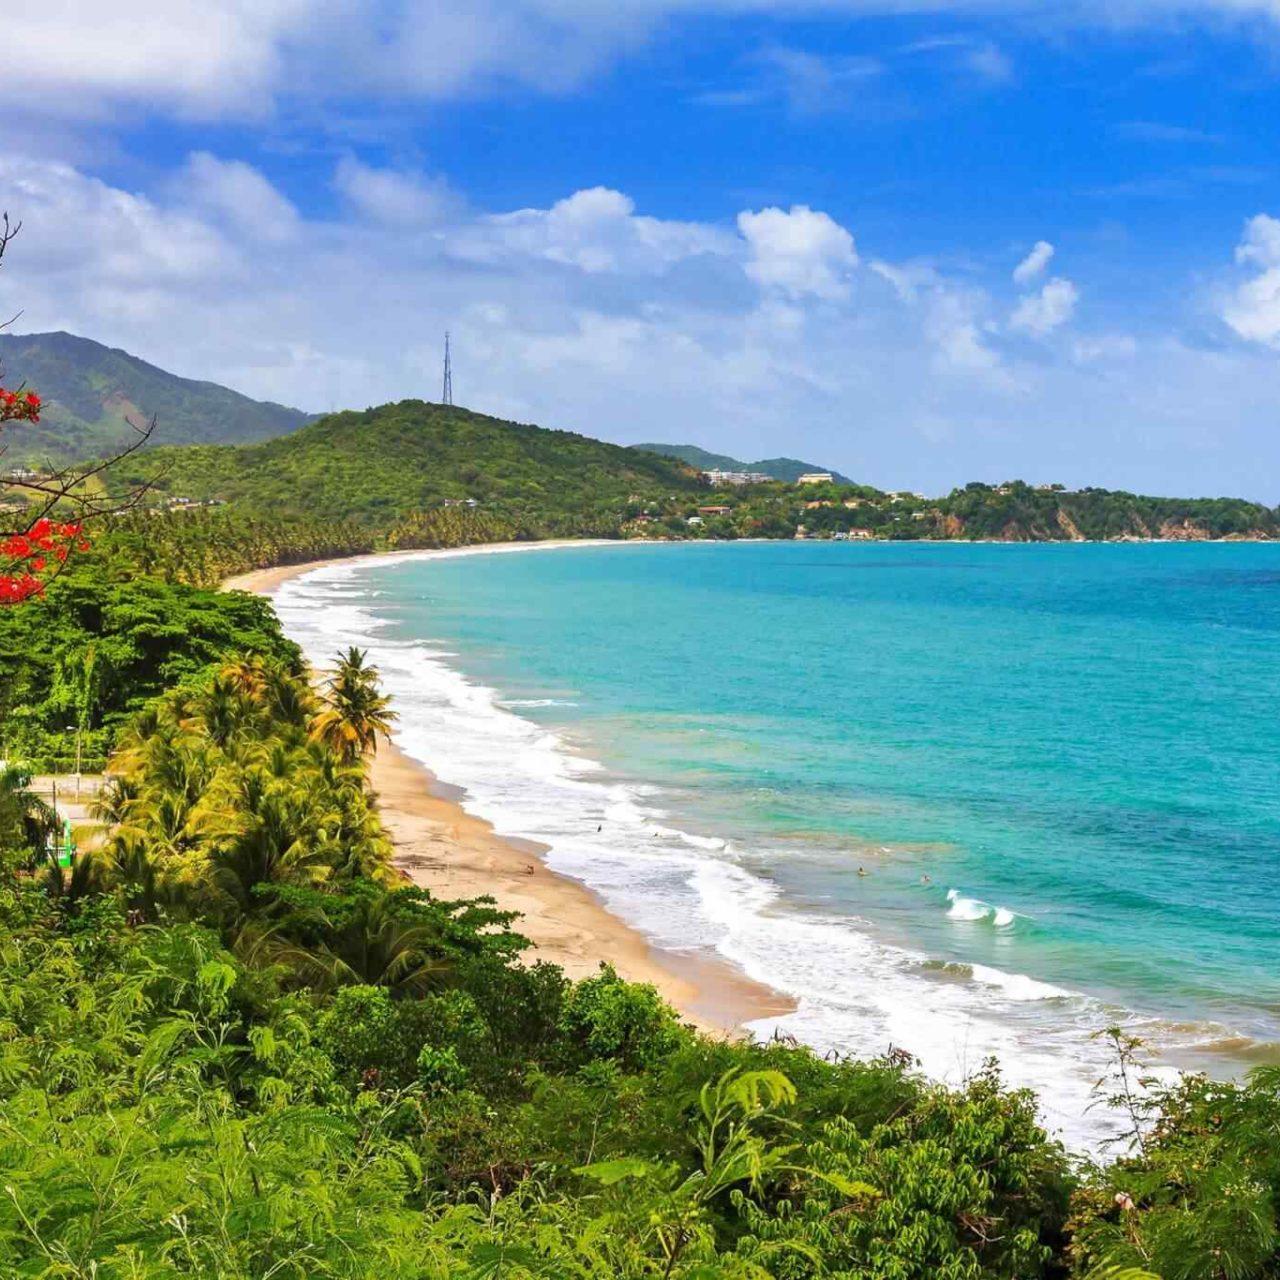 https://www.italiaholiday.it/wp-content/uploads/2018/09/destination-puerto-rico-01-1280x1280.jpg